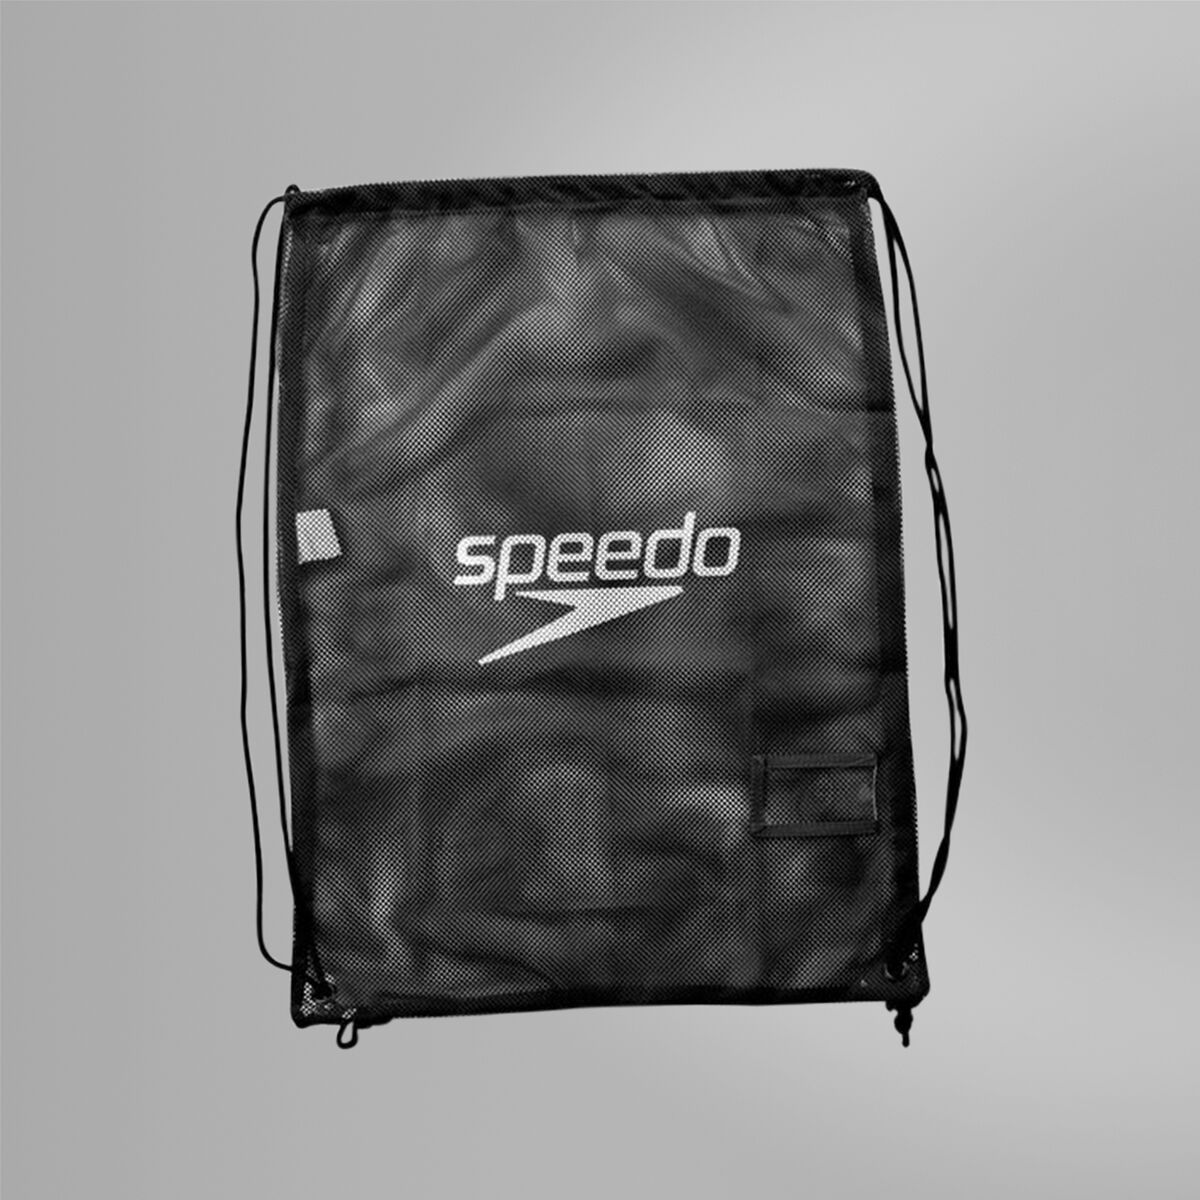 Equipment Mesh Bag